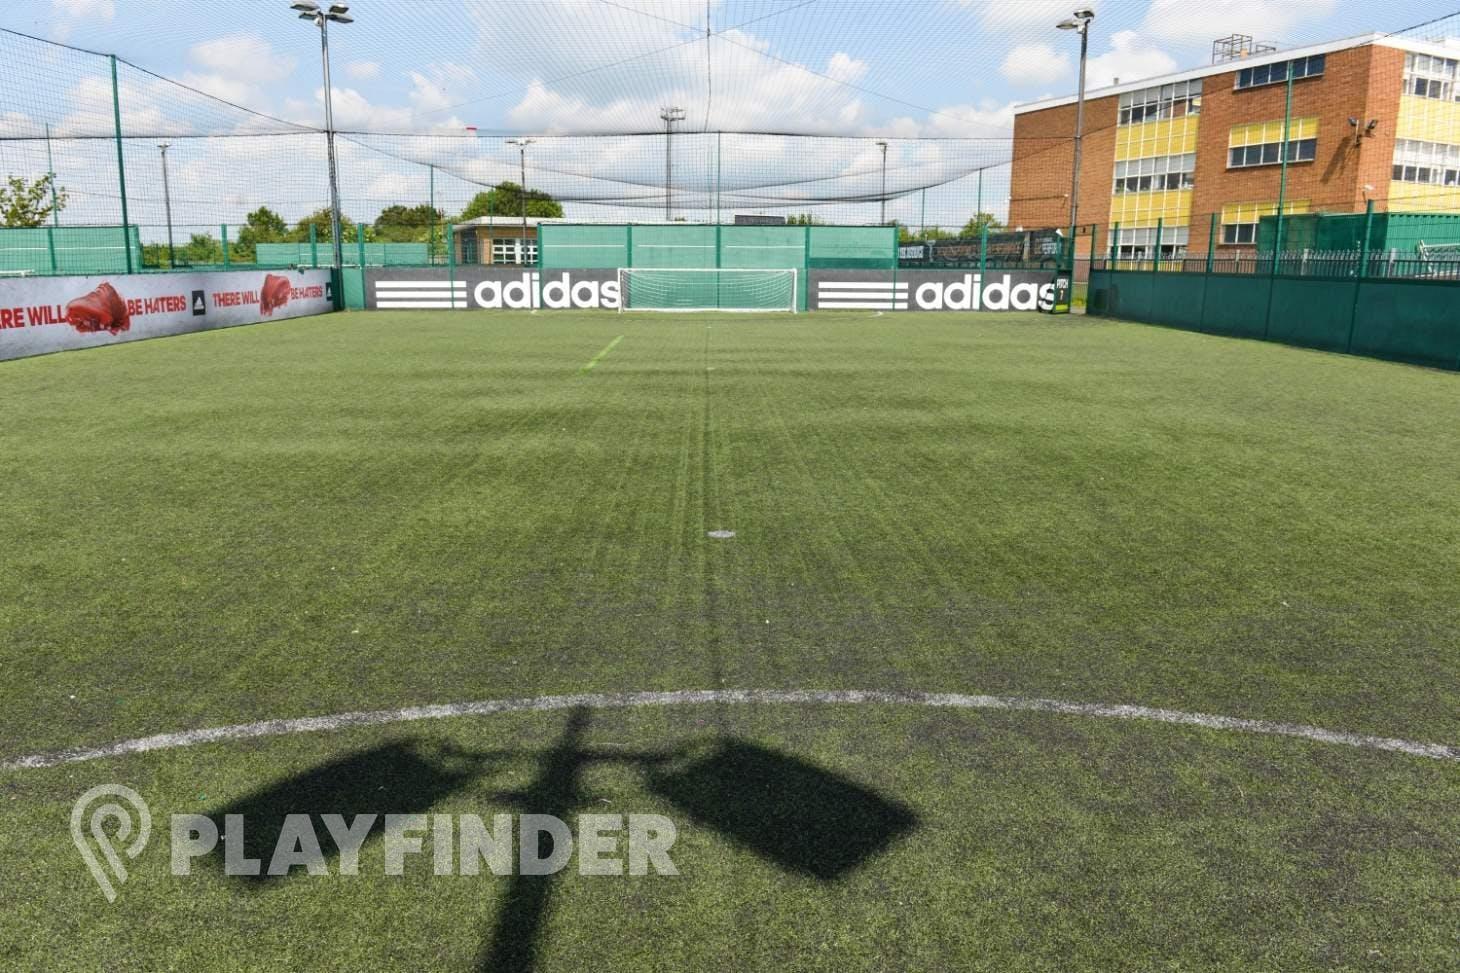 PlayFootball Luton 5 a side | 3G Astroturf football pitch